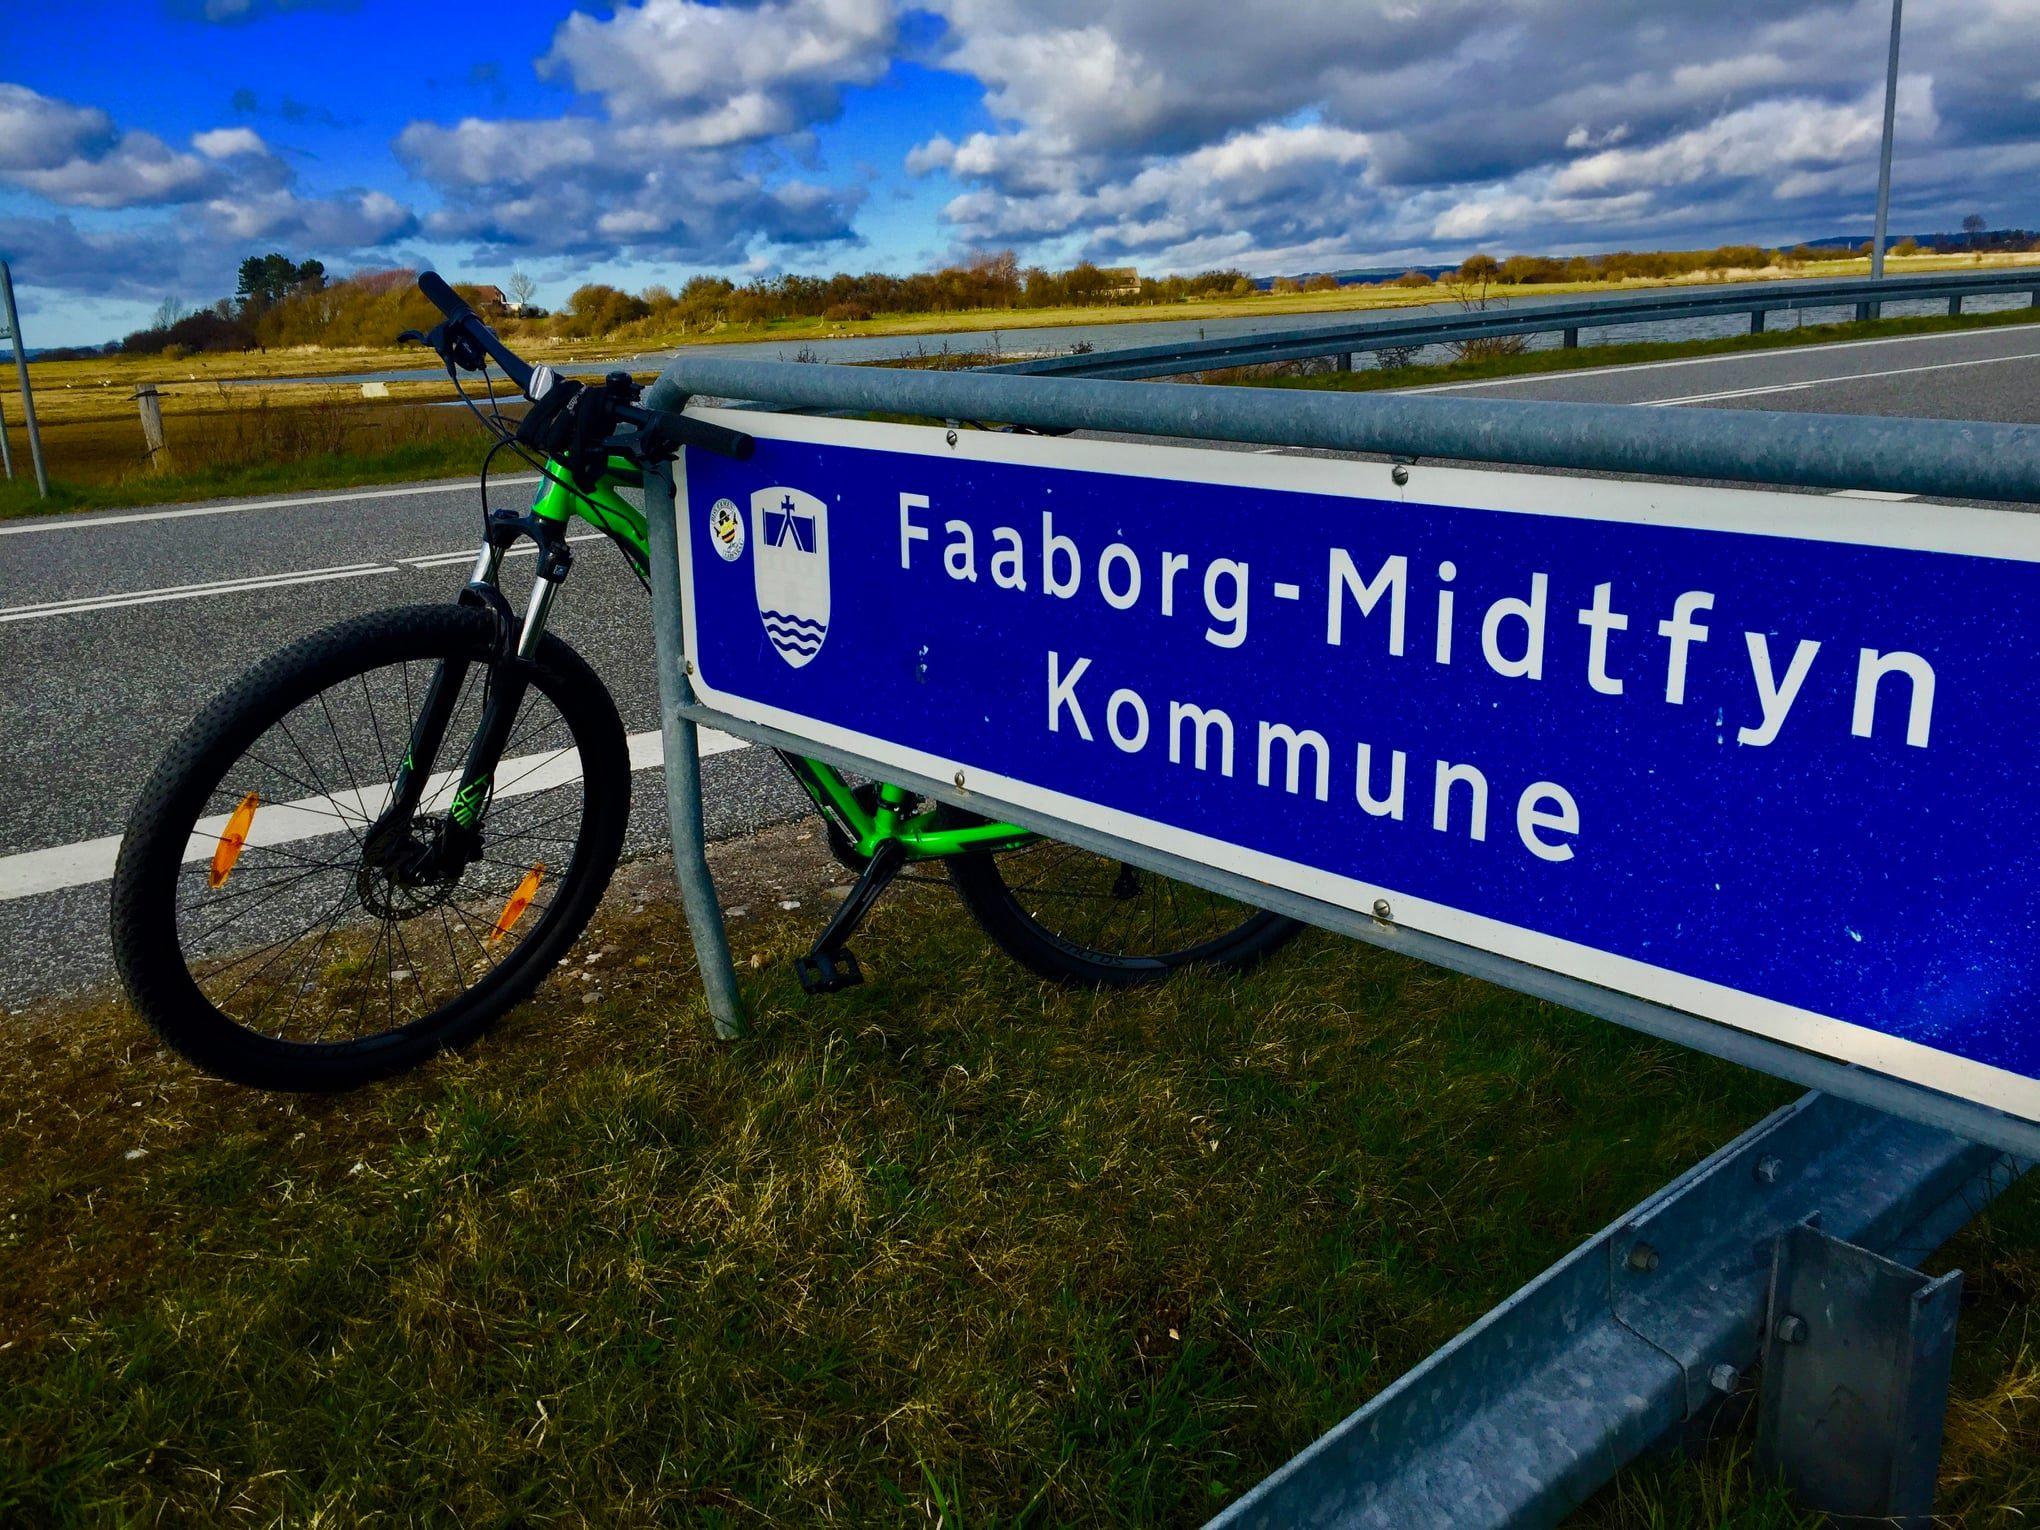 Faaborg kommune